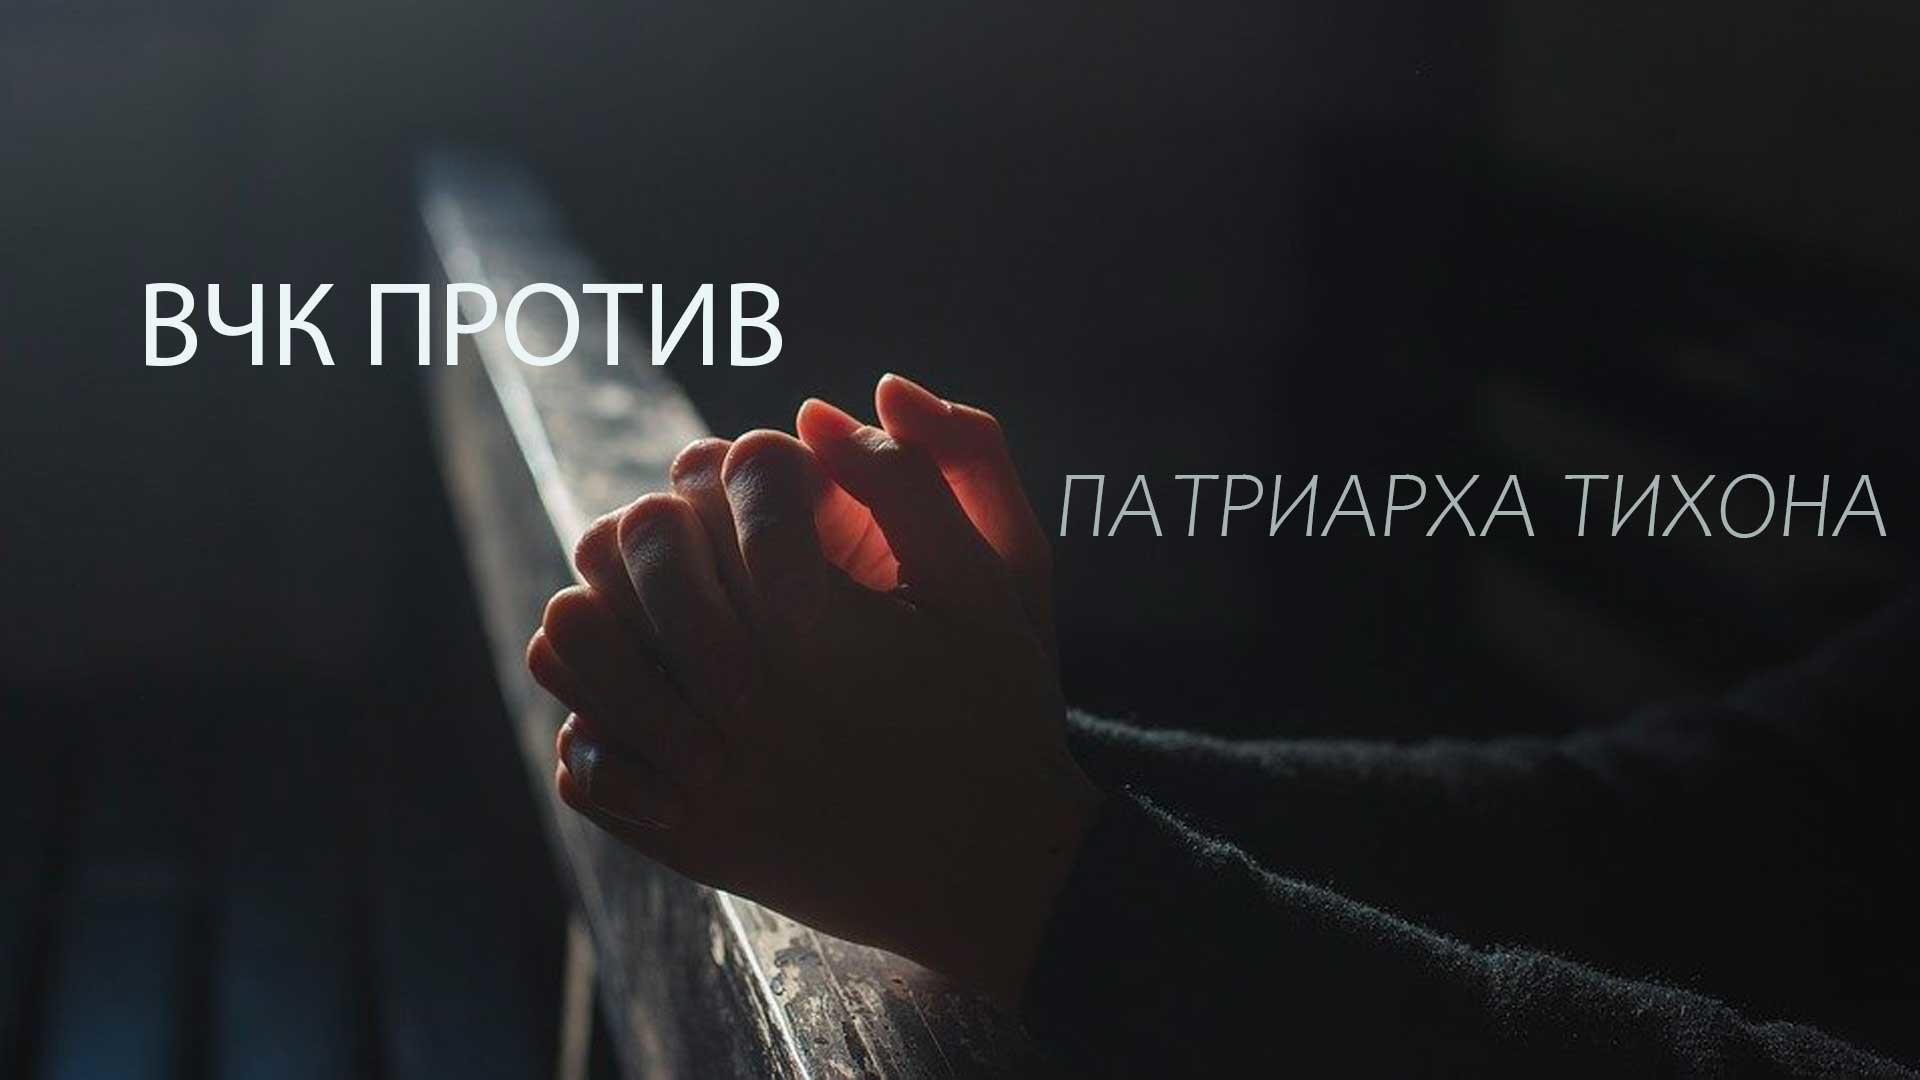 ВЧК против патриарха Тихона